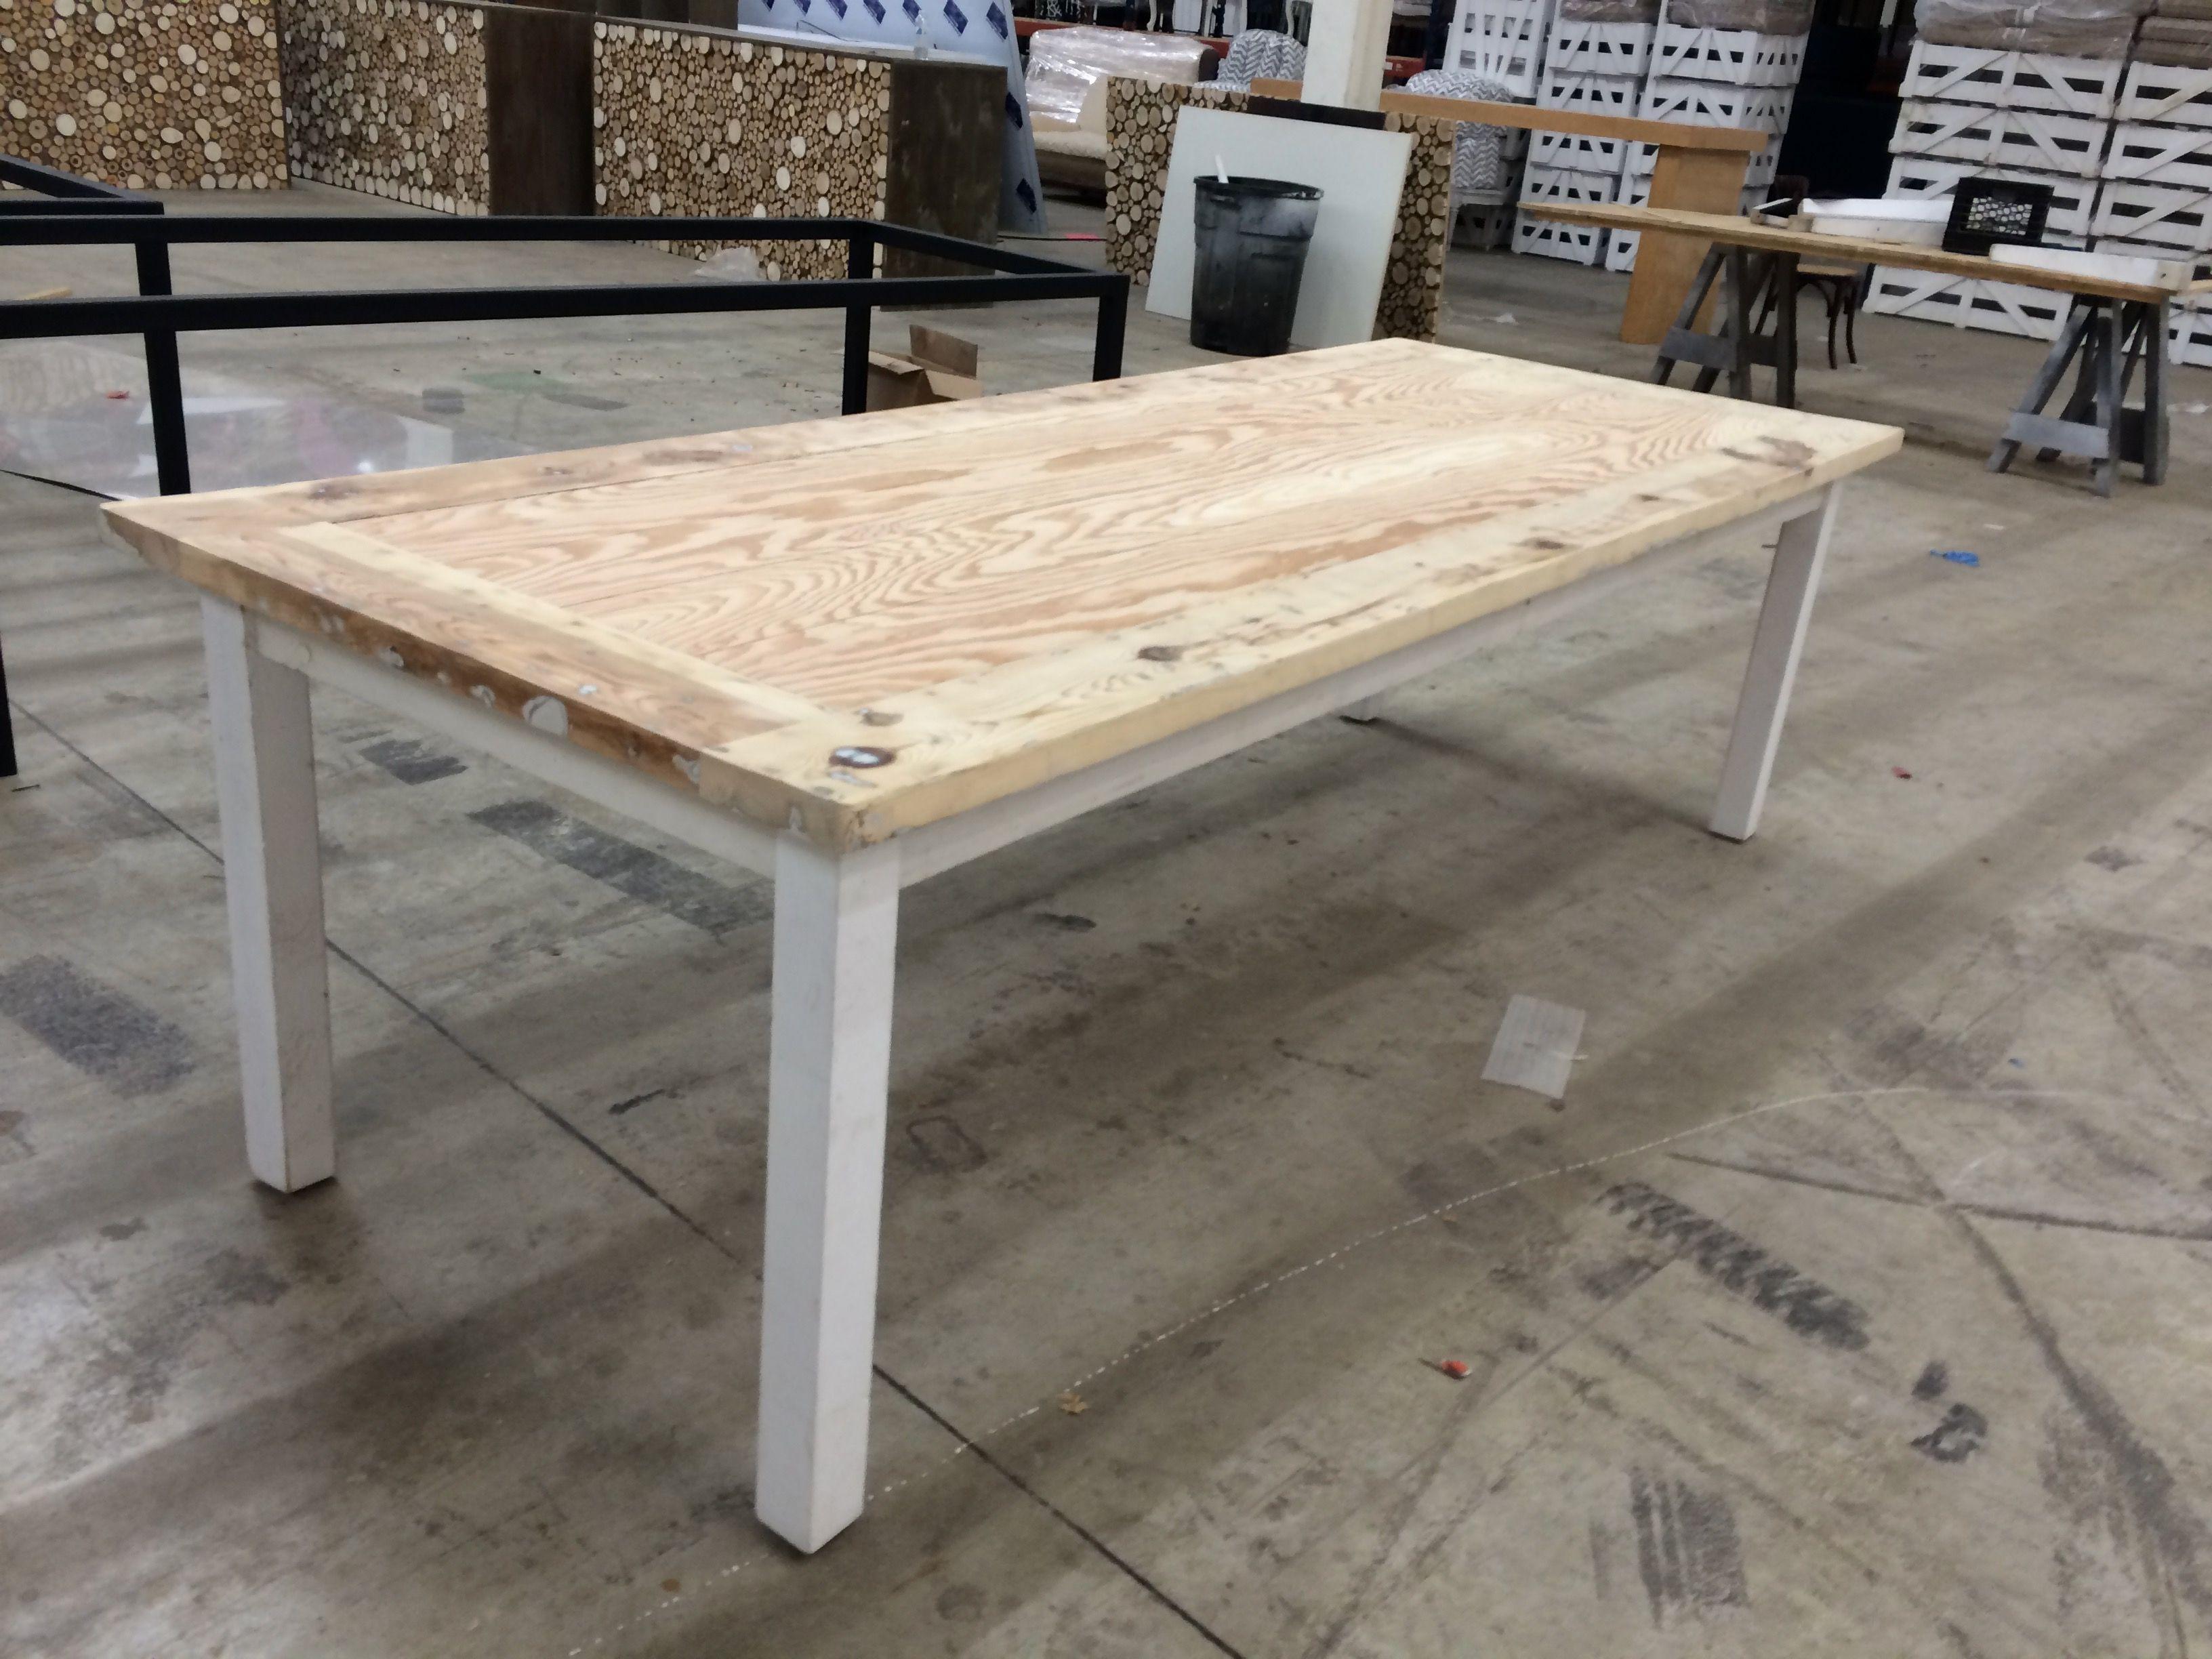 Surprising Custom Unfinished Farmhouse Table By Construct Custommade Com Interior Design Ideas Skatsoteloinfo